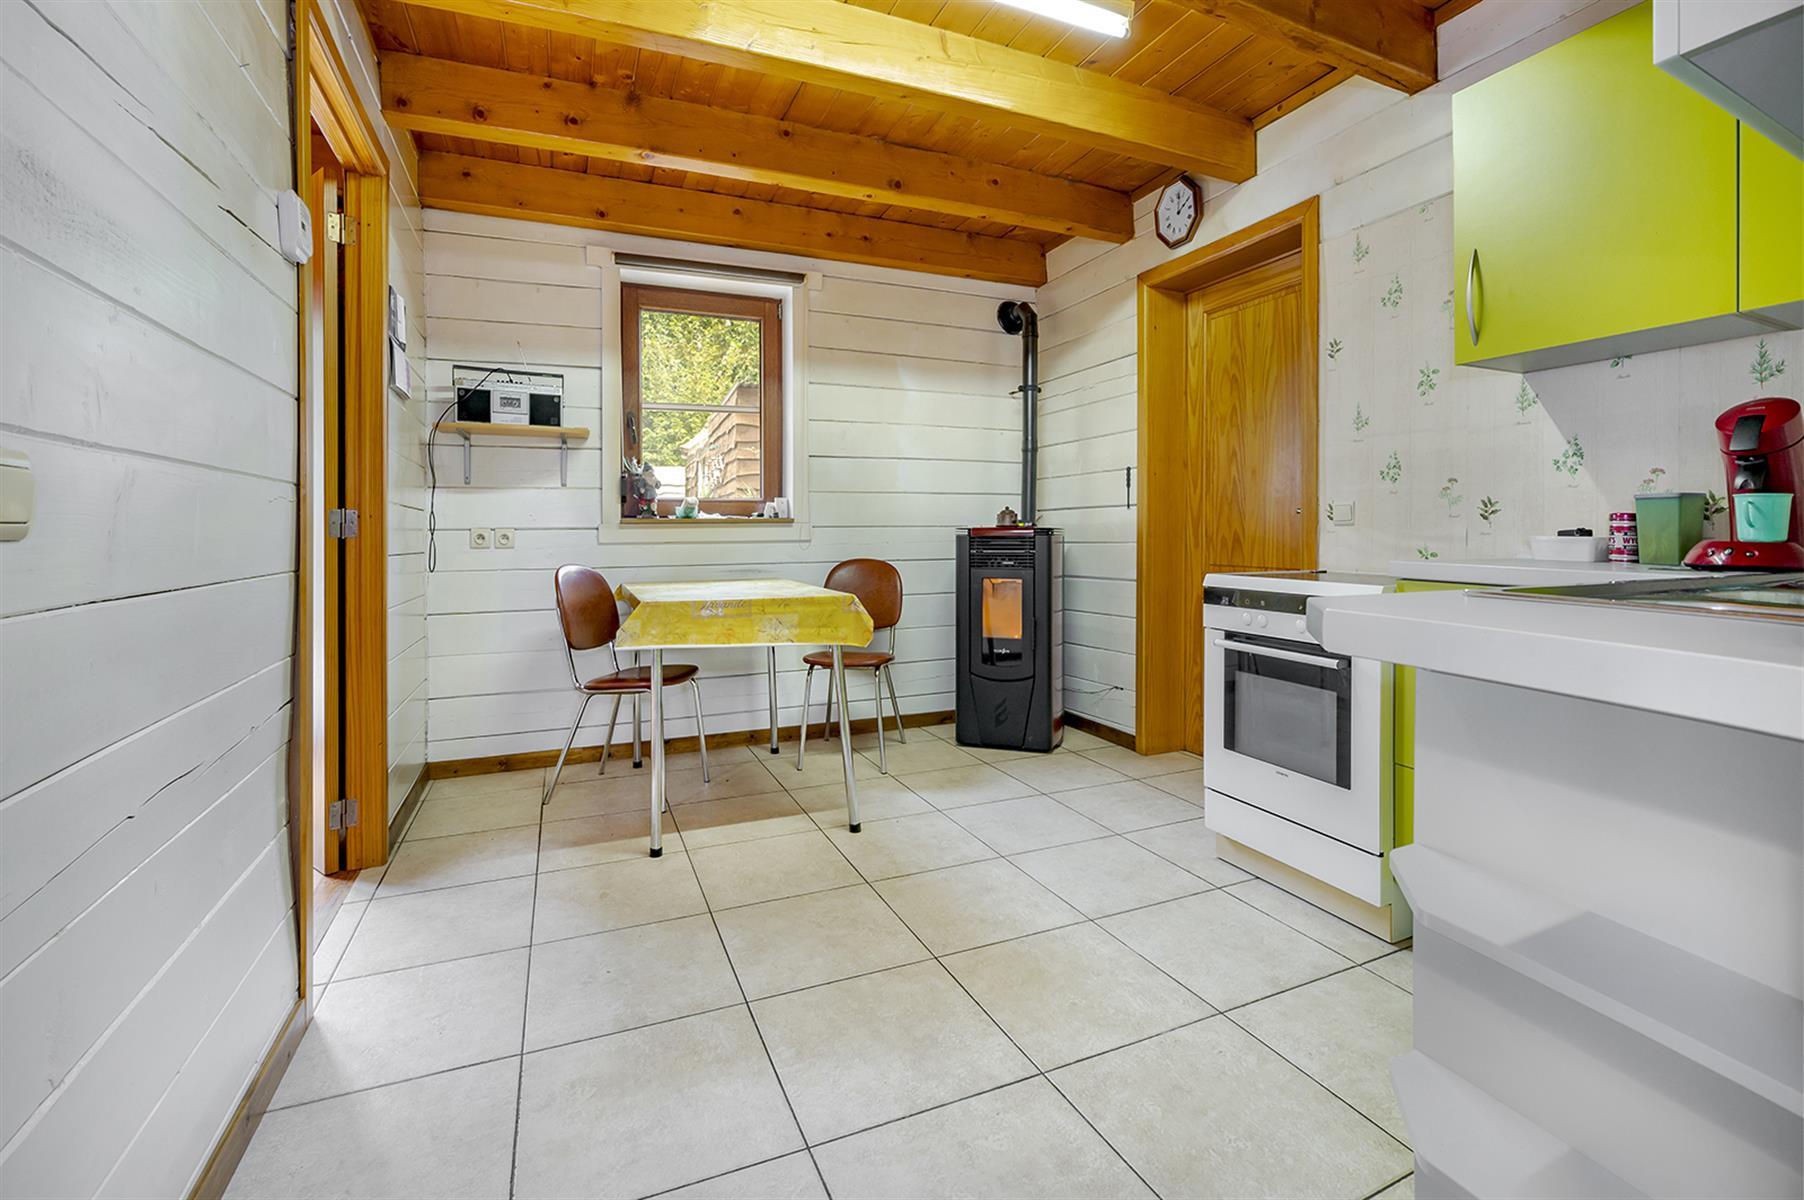 Maison - Berloz - #4189505-7